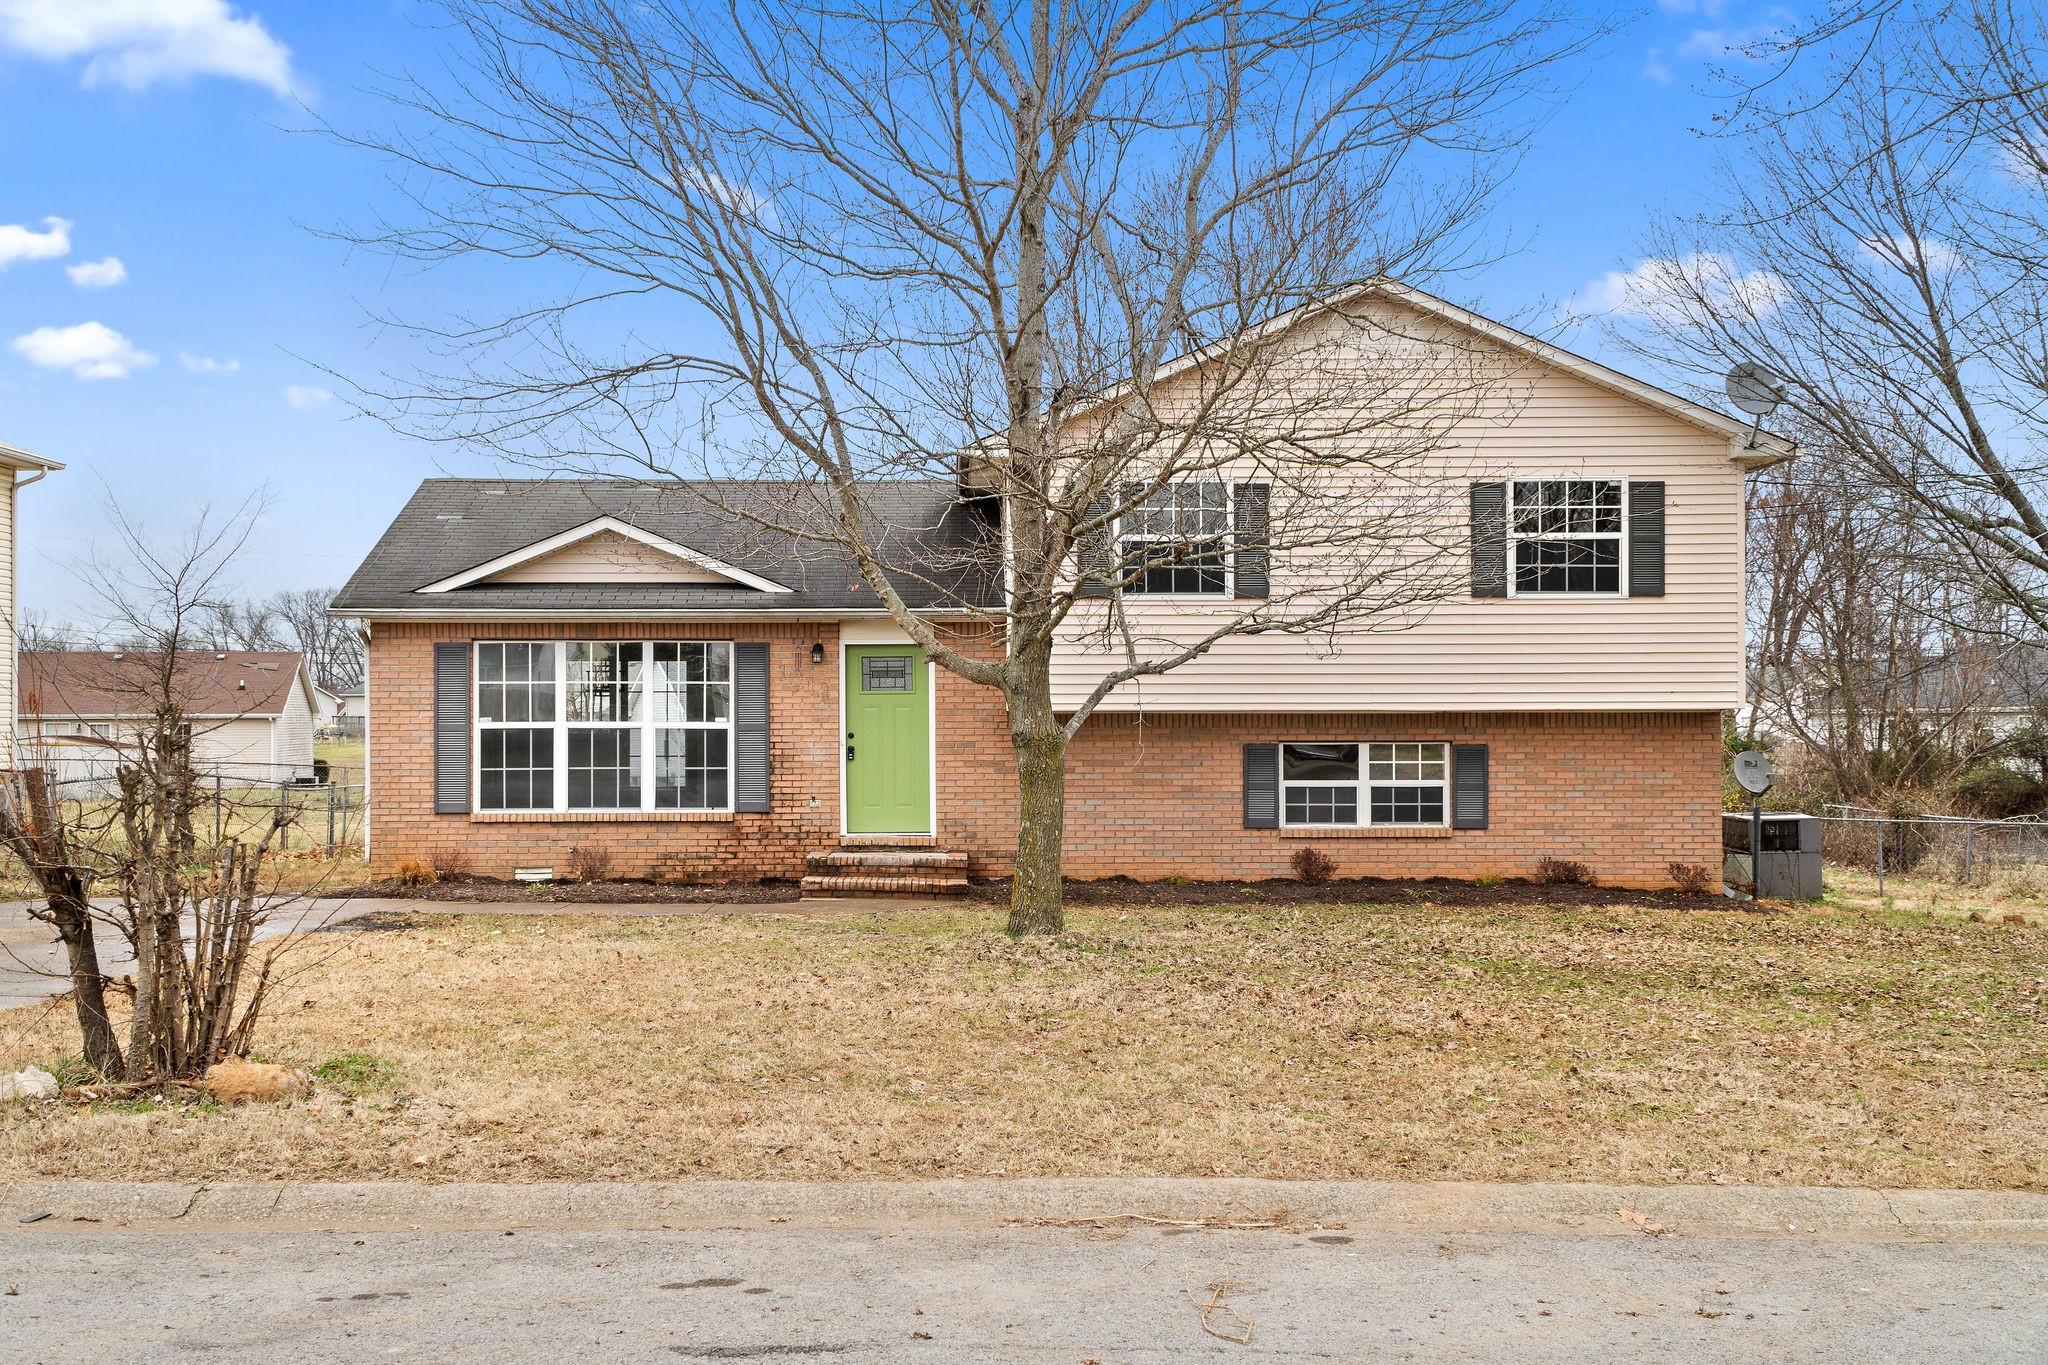 1013 Cooper Dr, Oak Grove, KY 42262 - Oak Grove, KY real estate listing